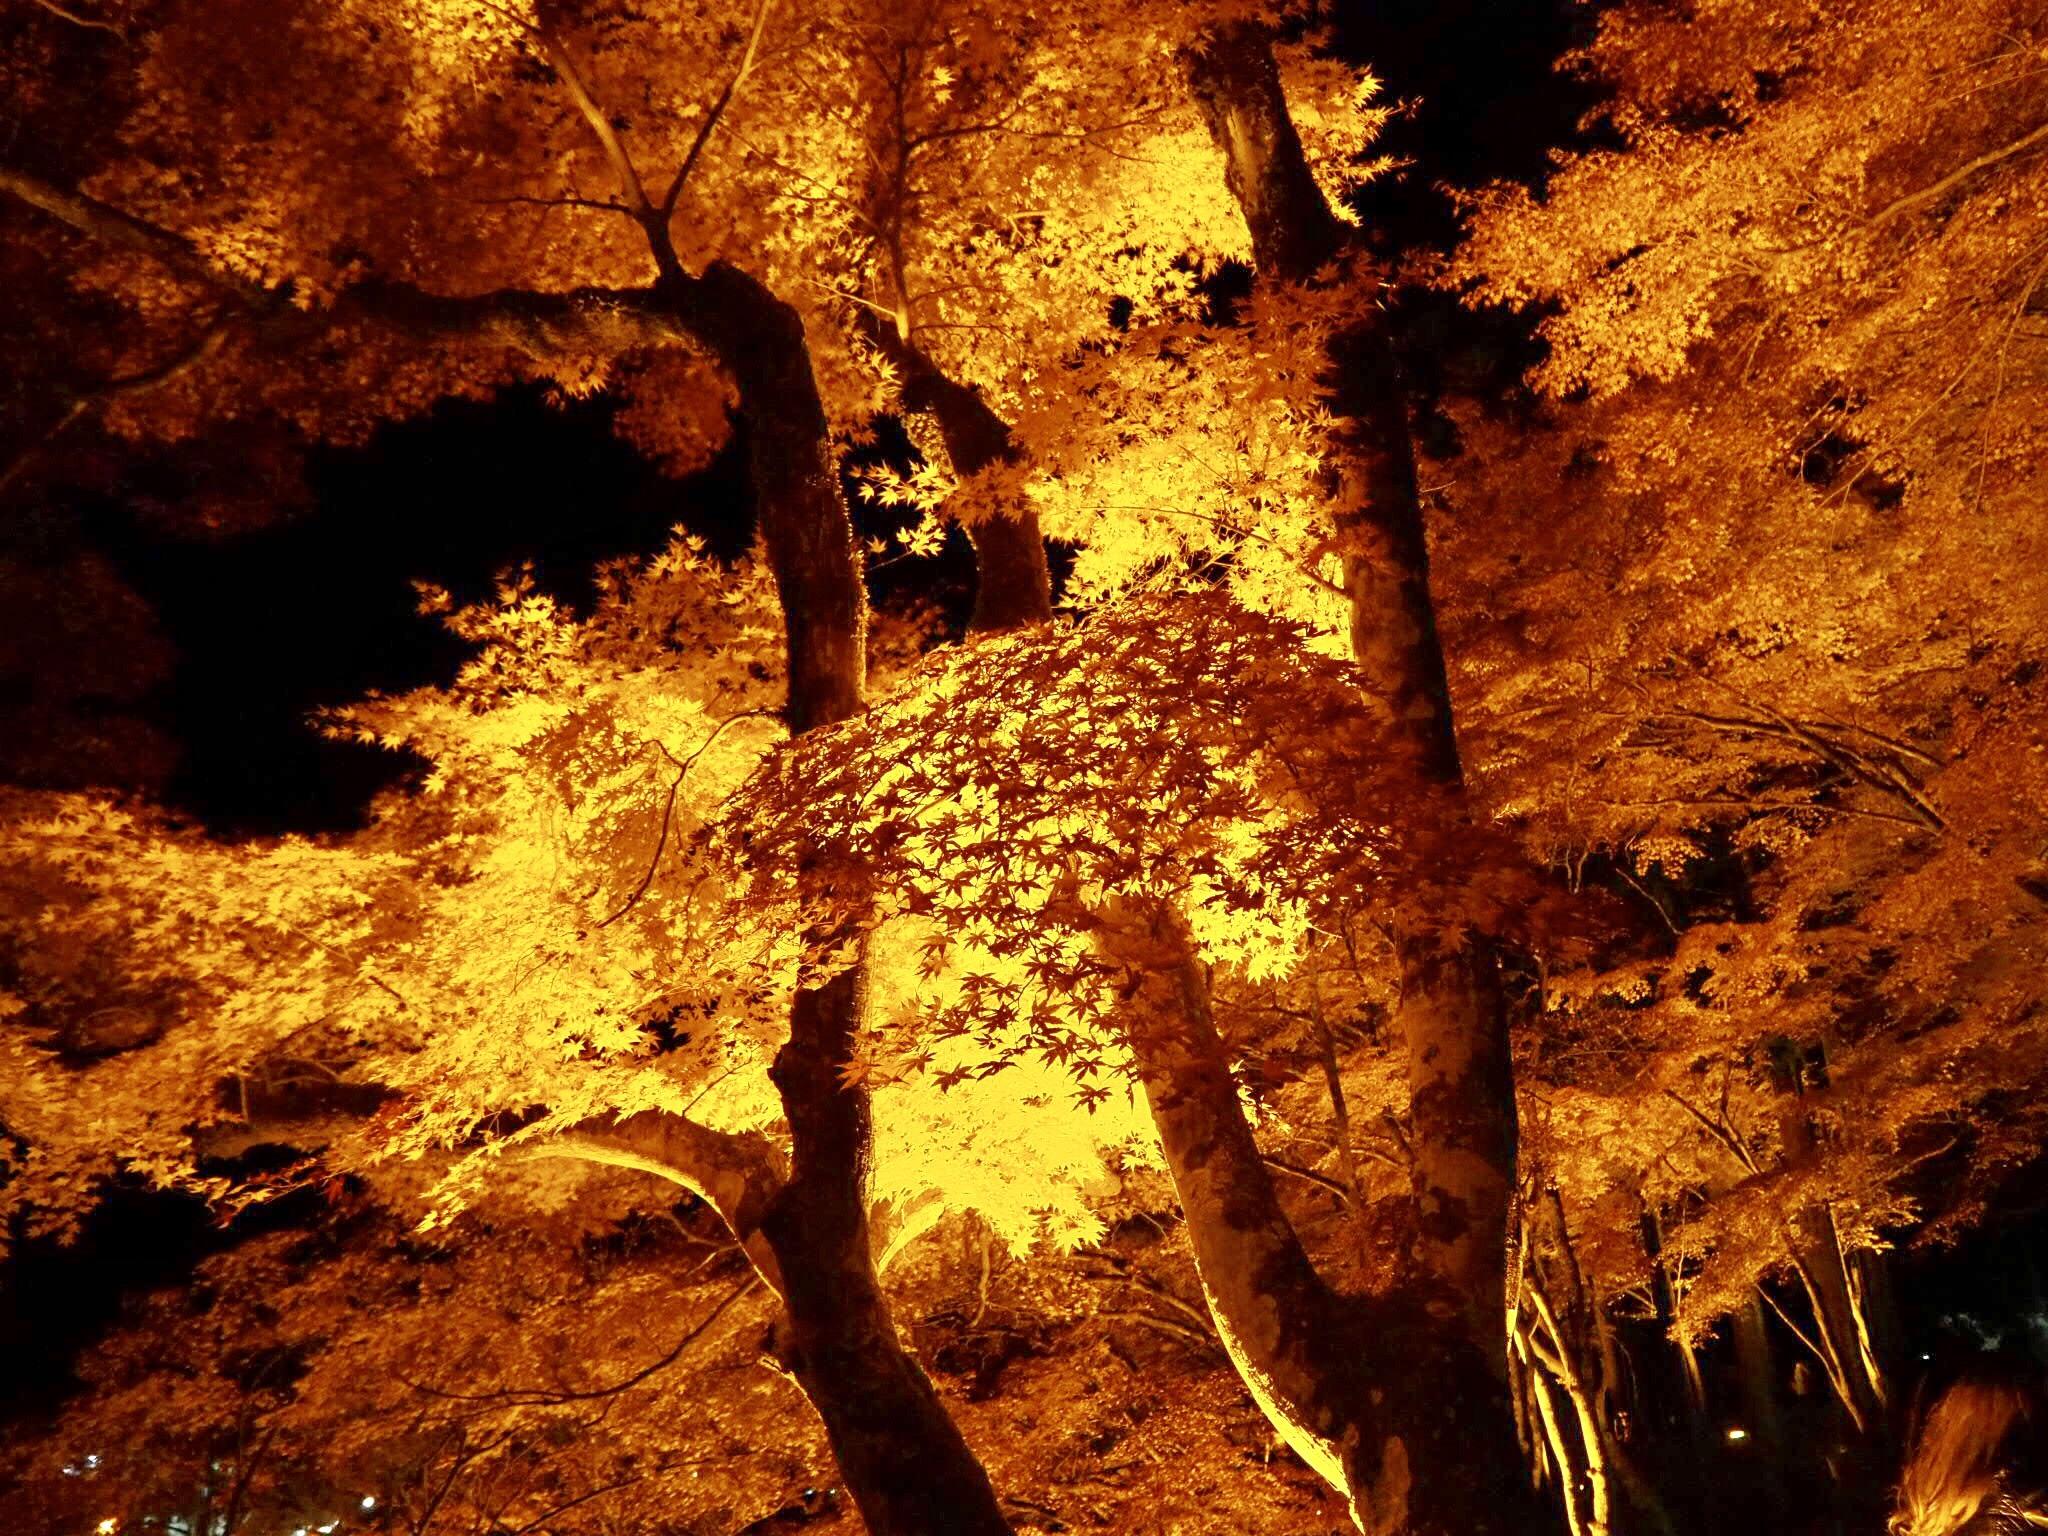 img 7568 - 香嵐渓 - 日本の秋を感じる 愛知県豊田市の紅葉スポット